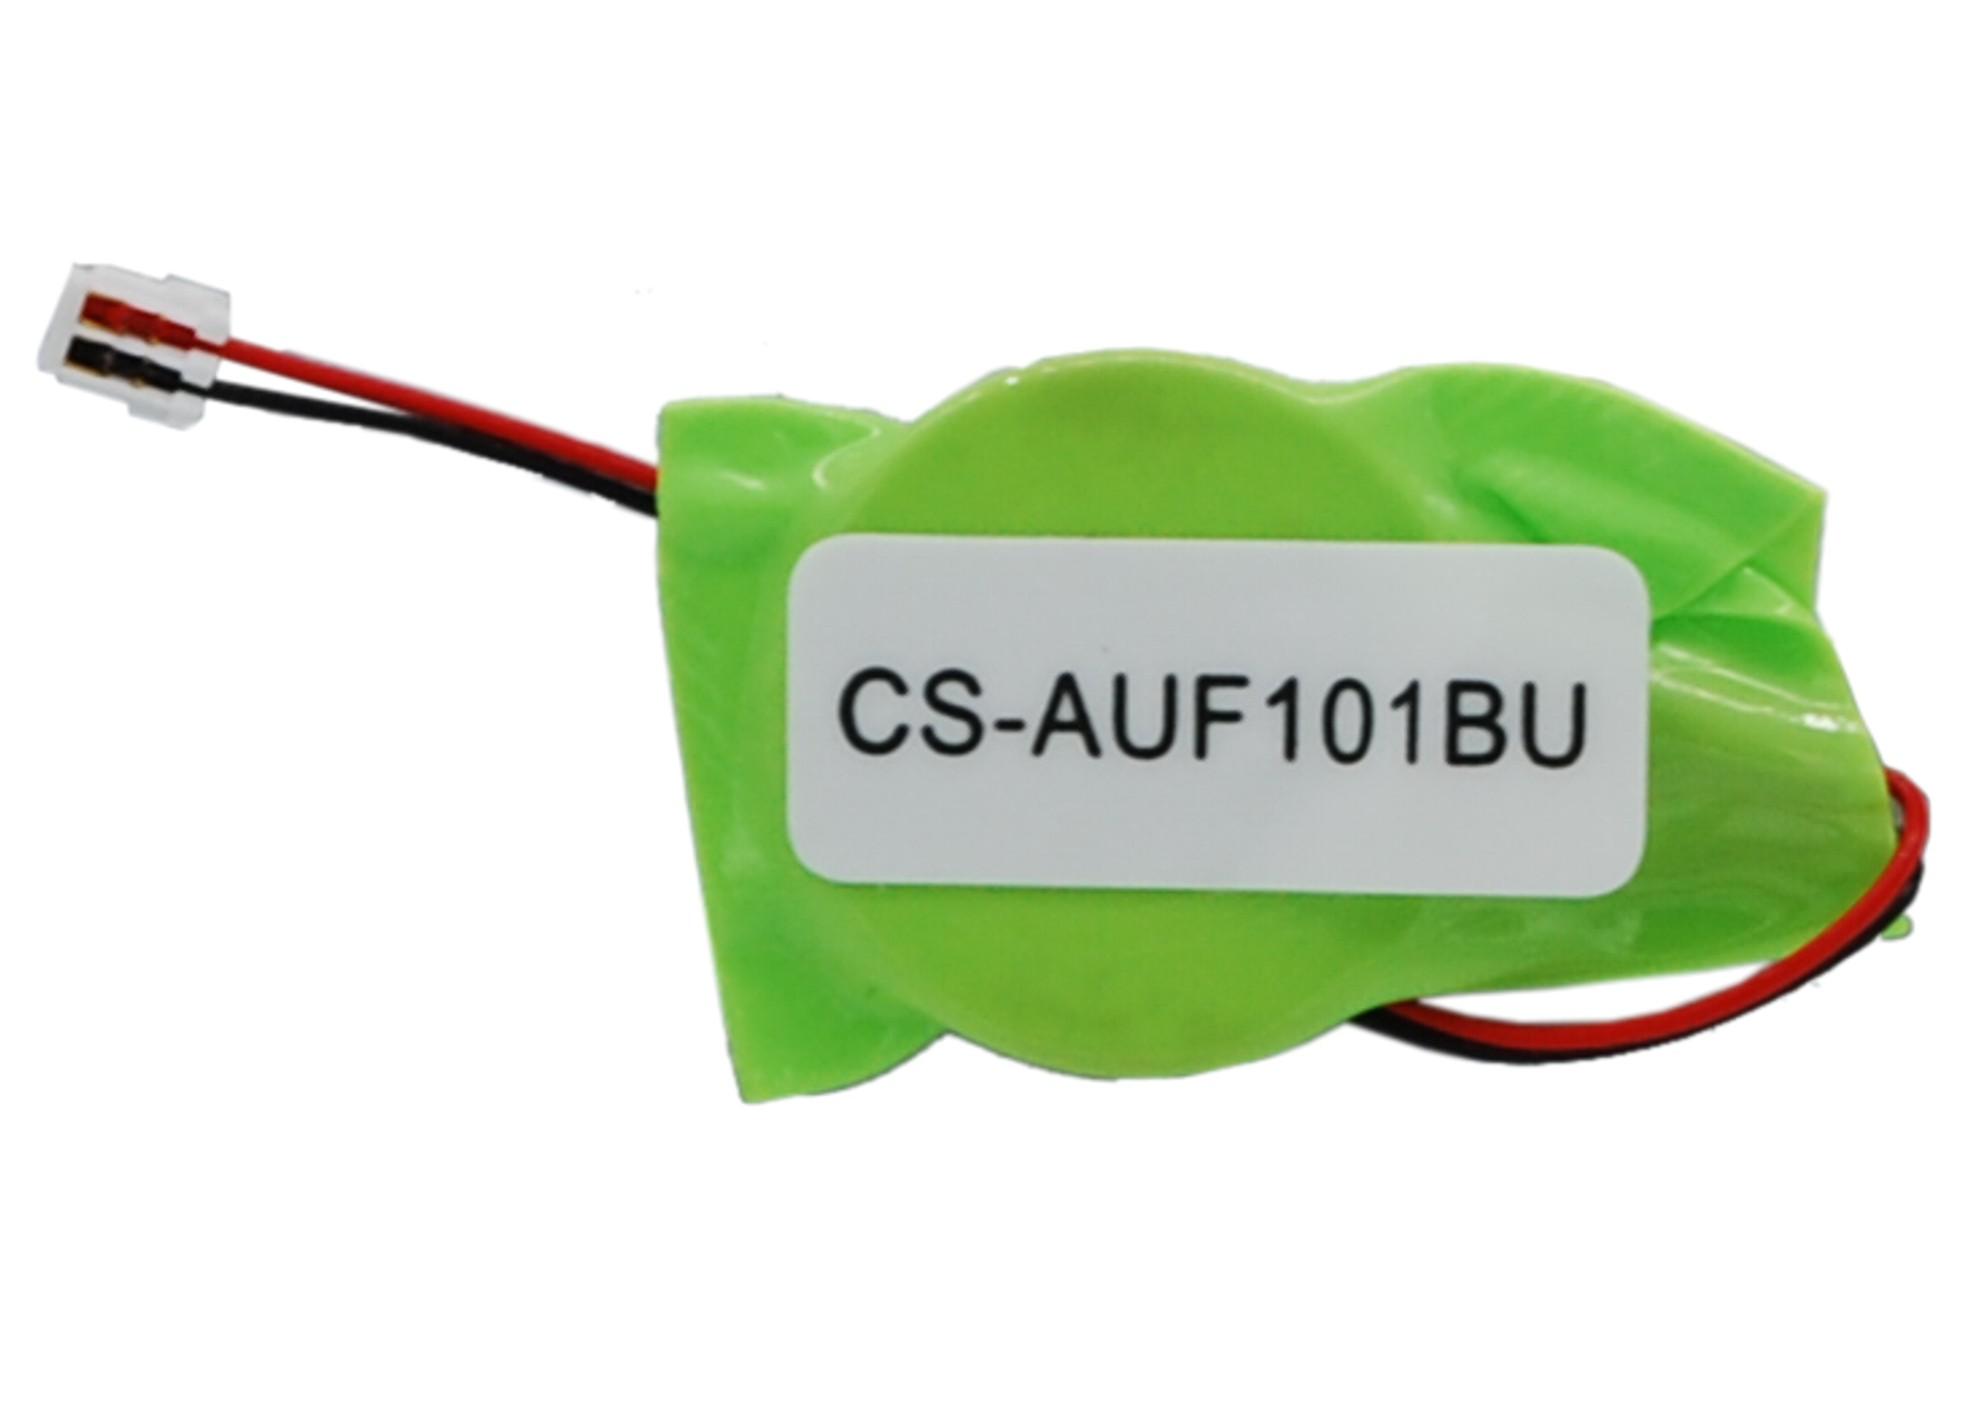 Cameron Sino baterie cmos pro ASUS Eee Pad Transformer TF101-1B006A 3V Li-ion 40mAh zelená - neoriginální